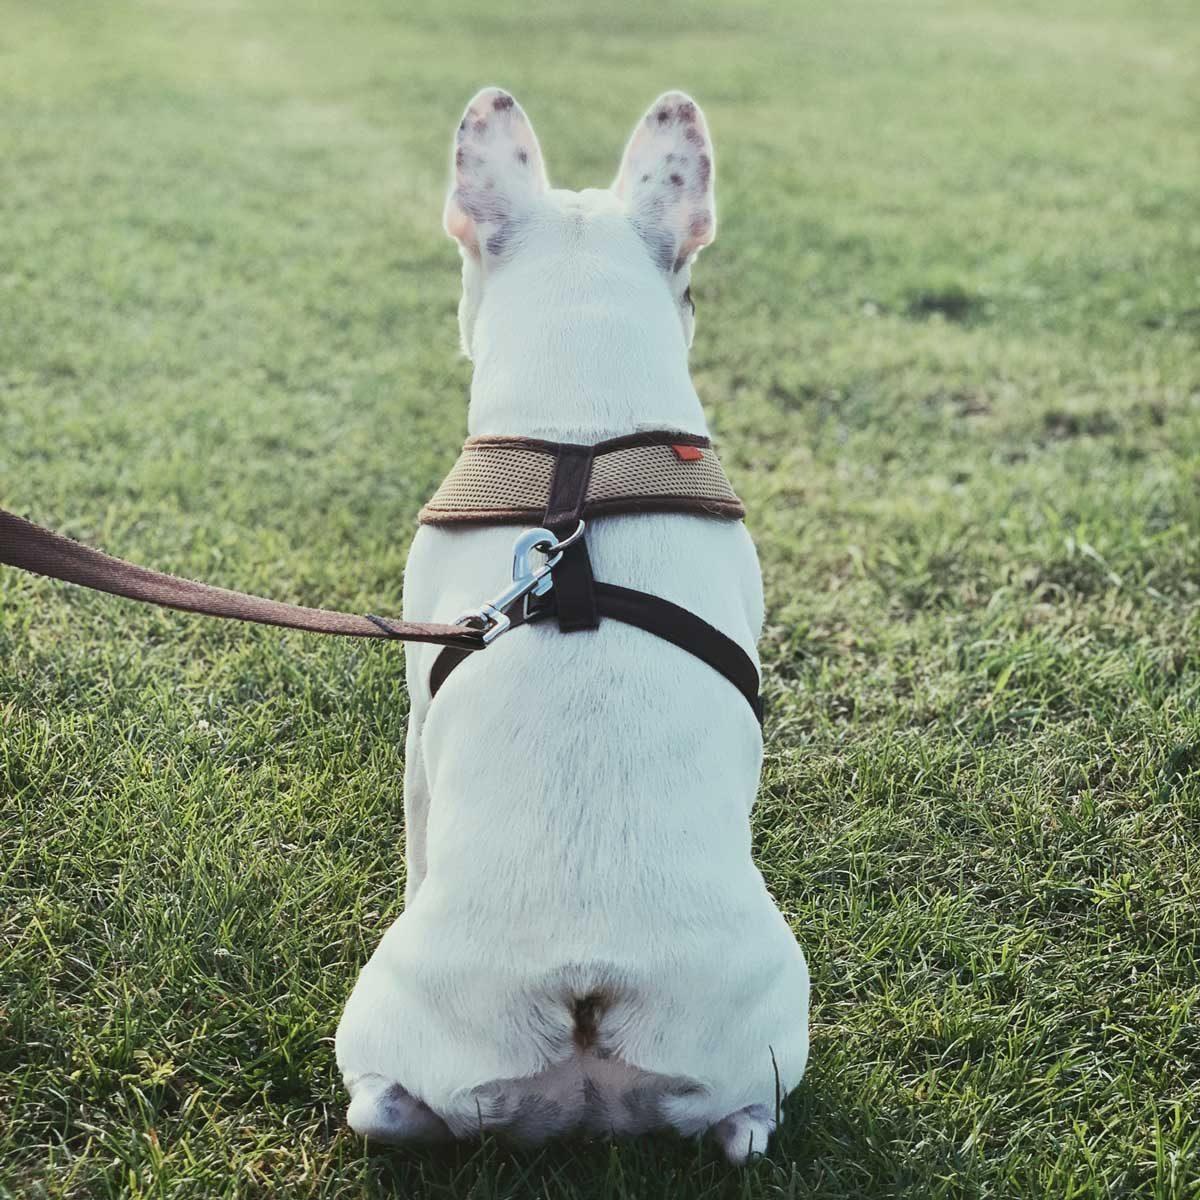 Dog wearing a harness